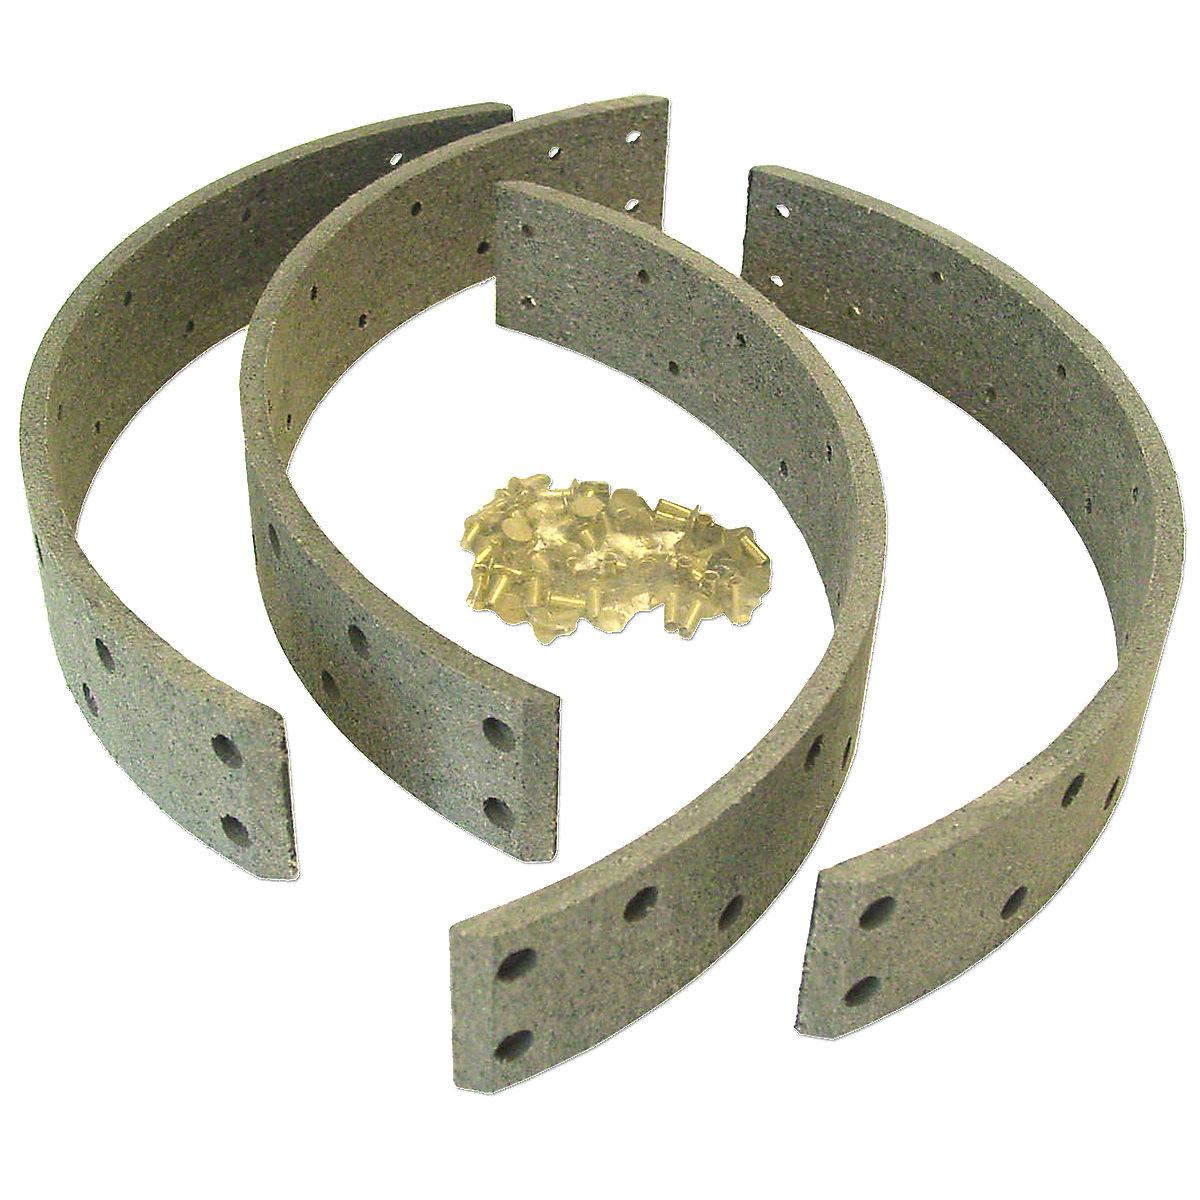 Brake Shoe Rivets : Abc brake lining set with rivets